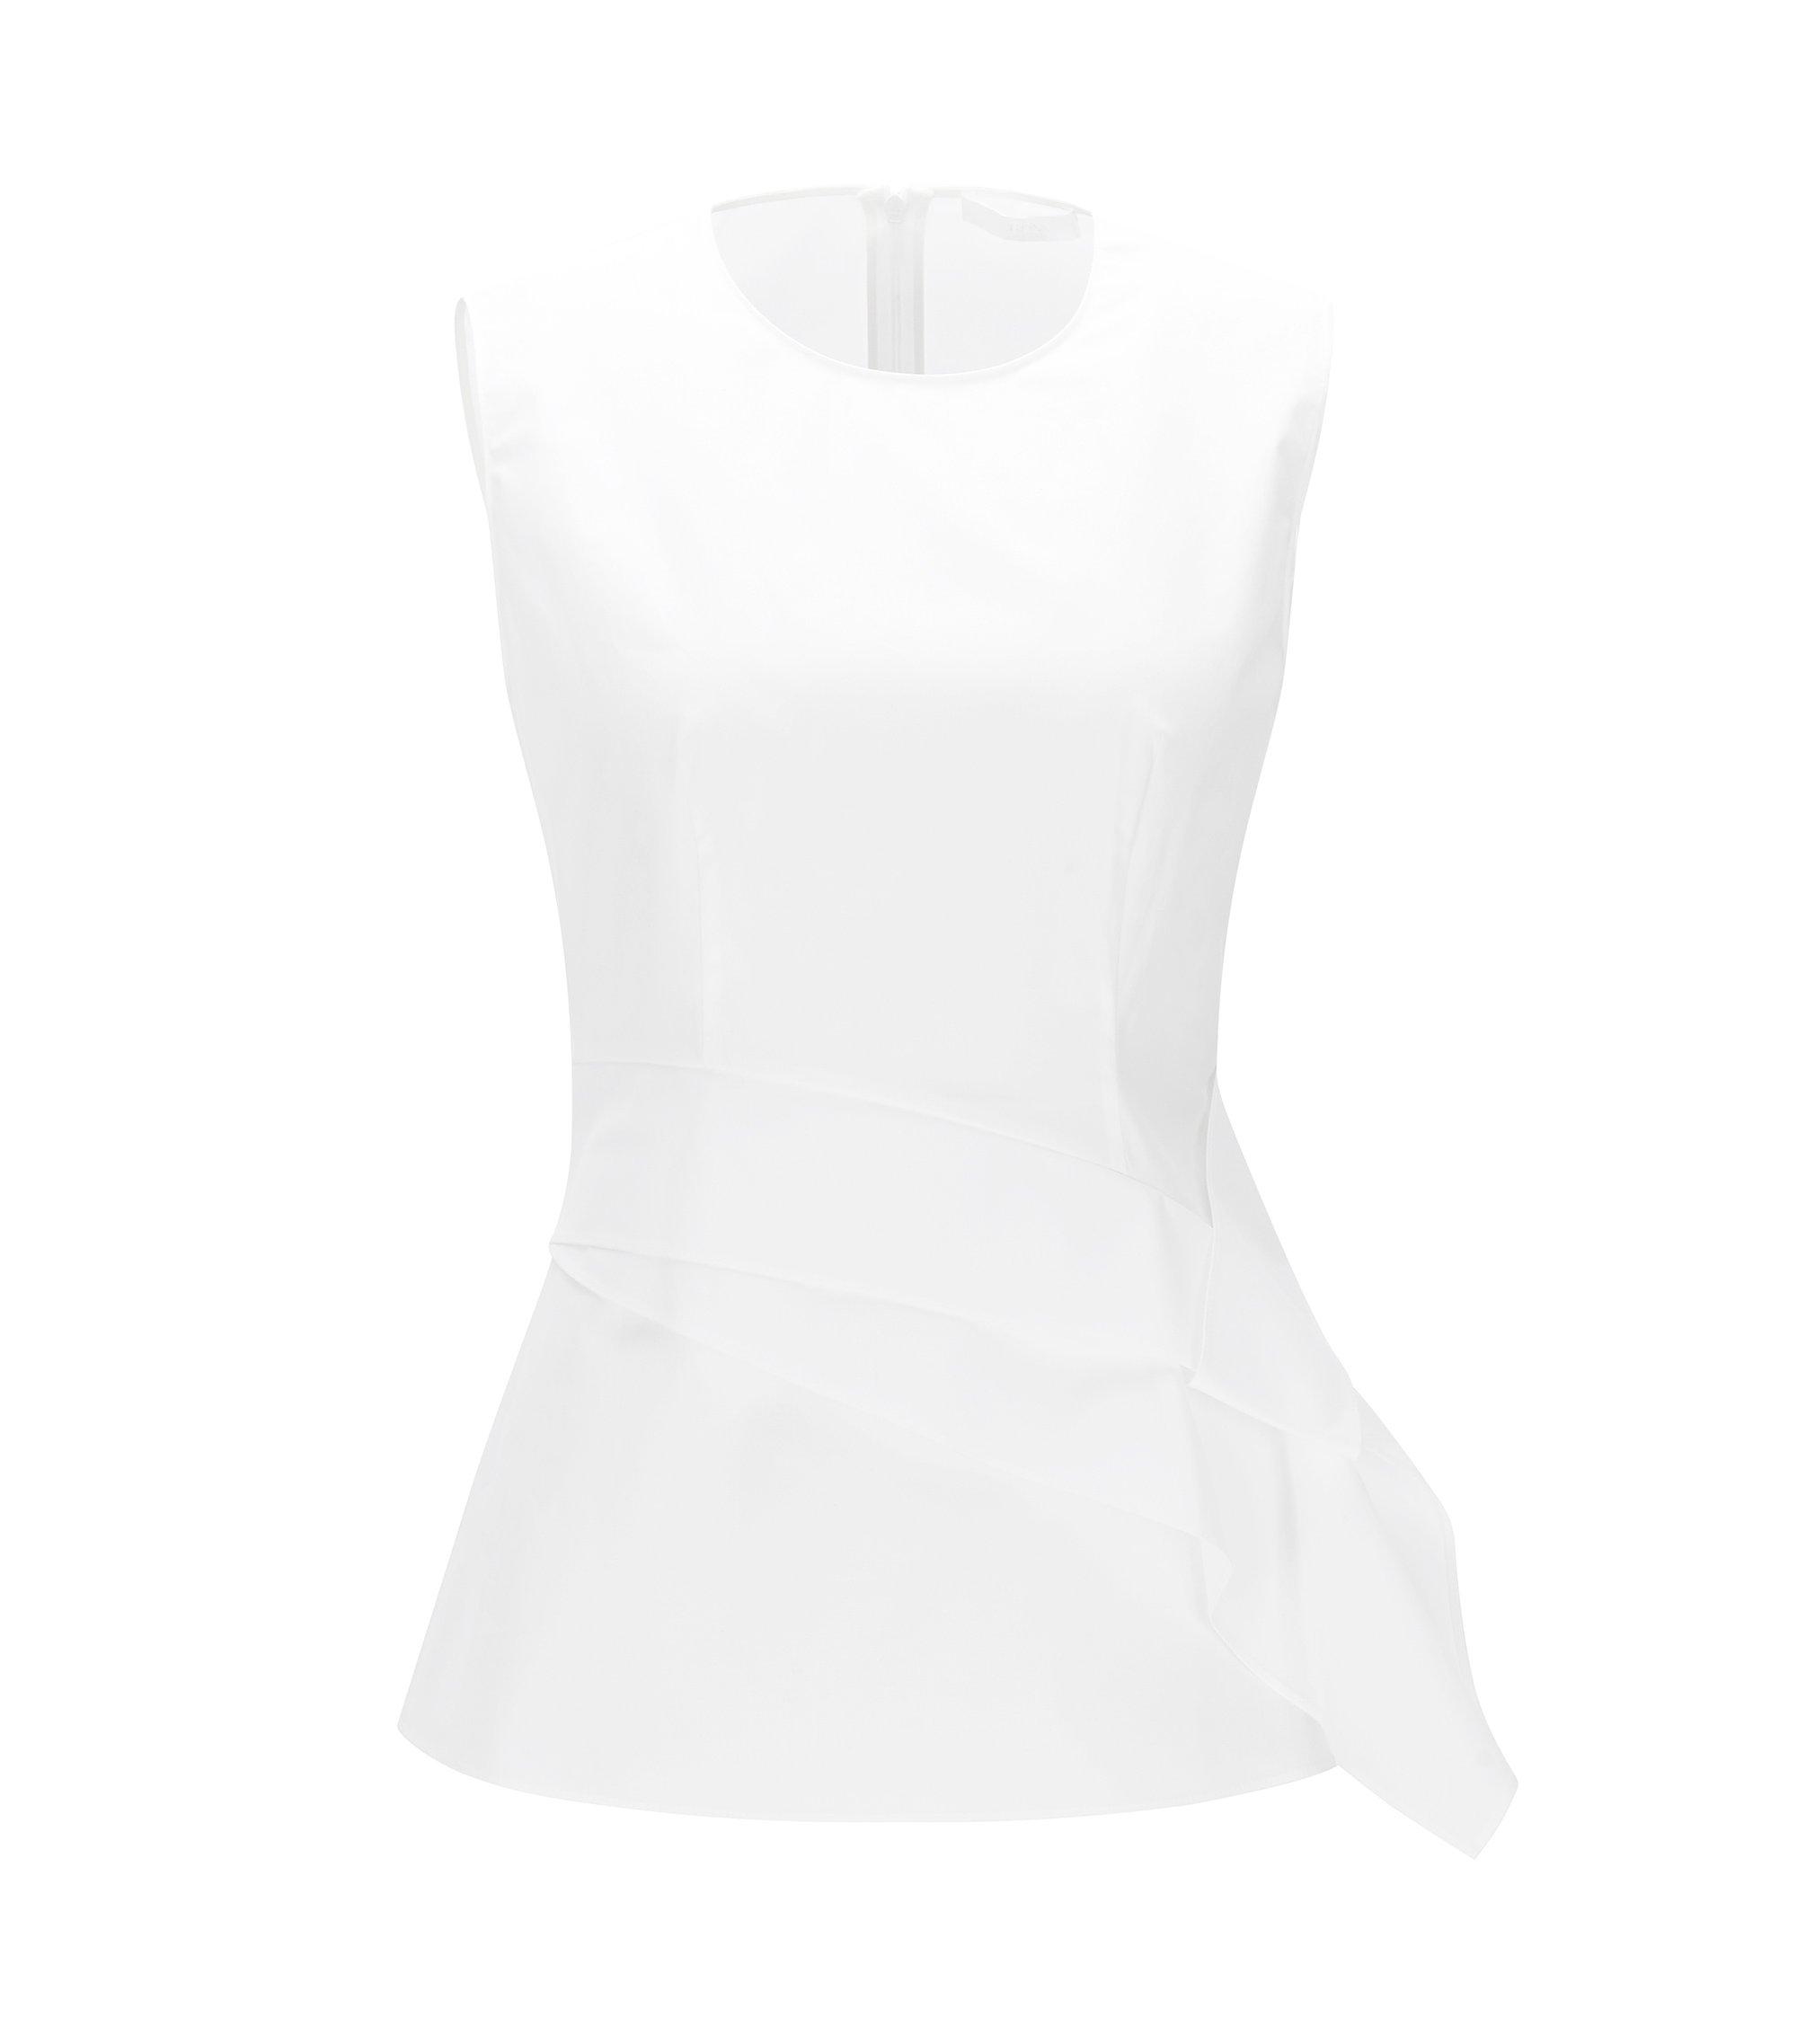 Waist-Tie Stretch Cotton Top | Lanina, White